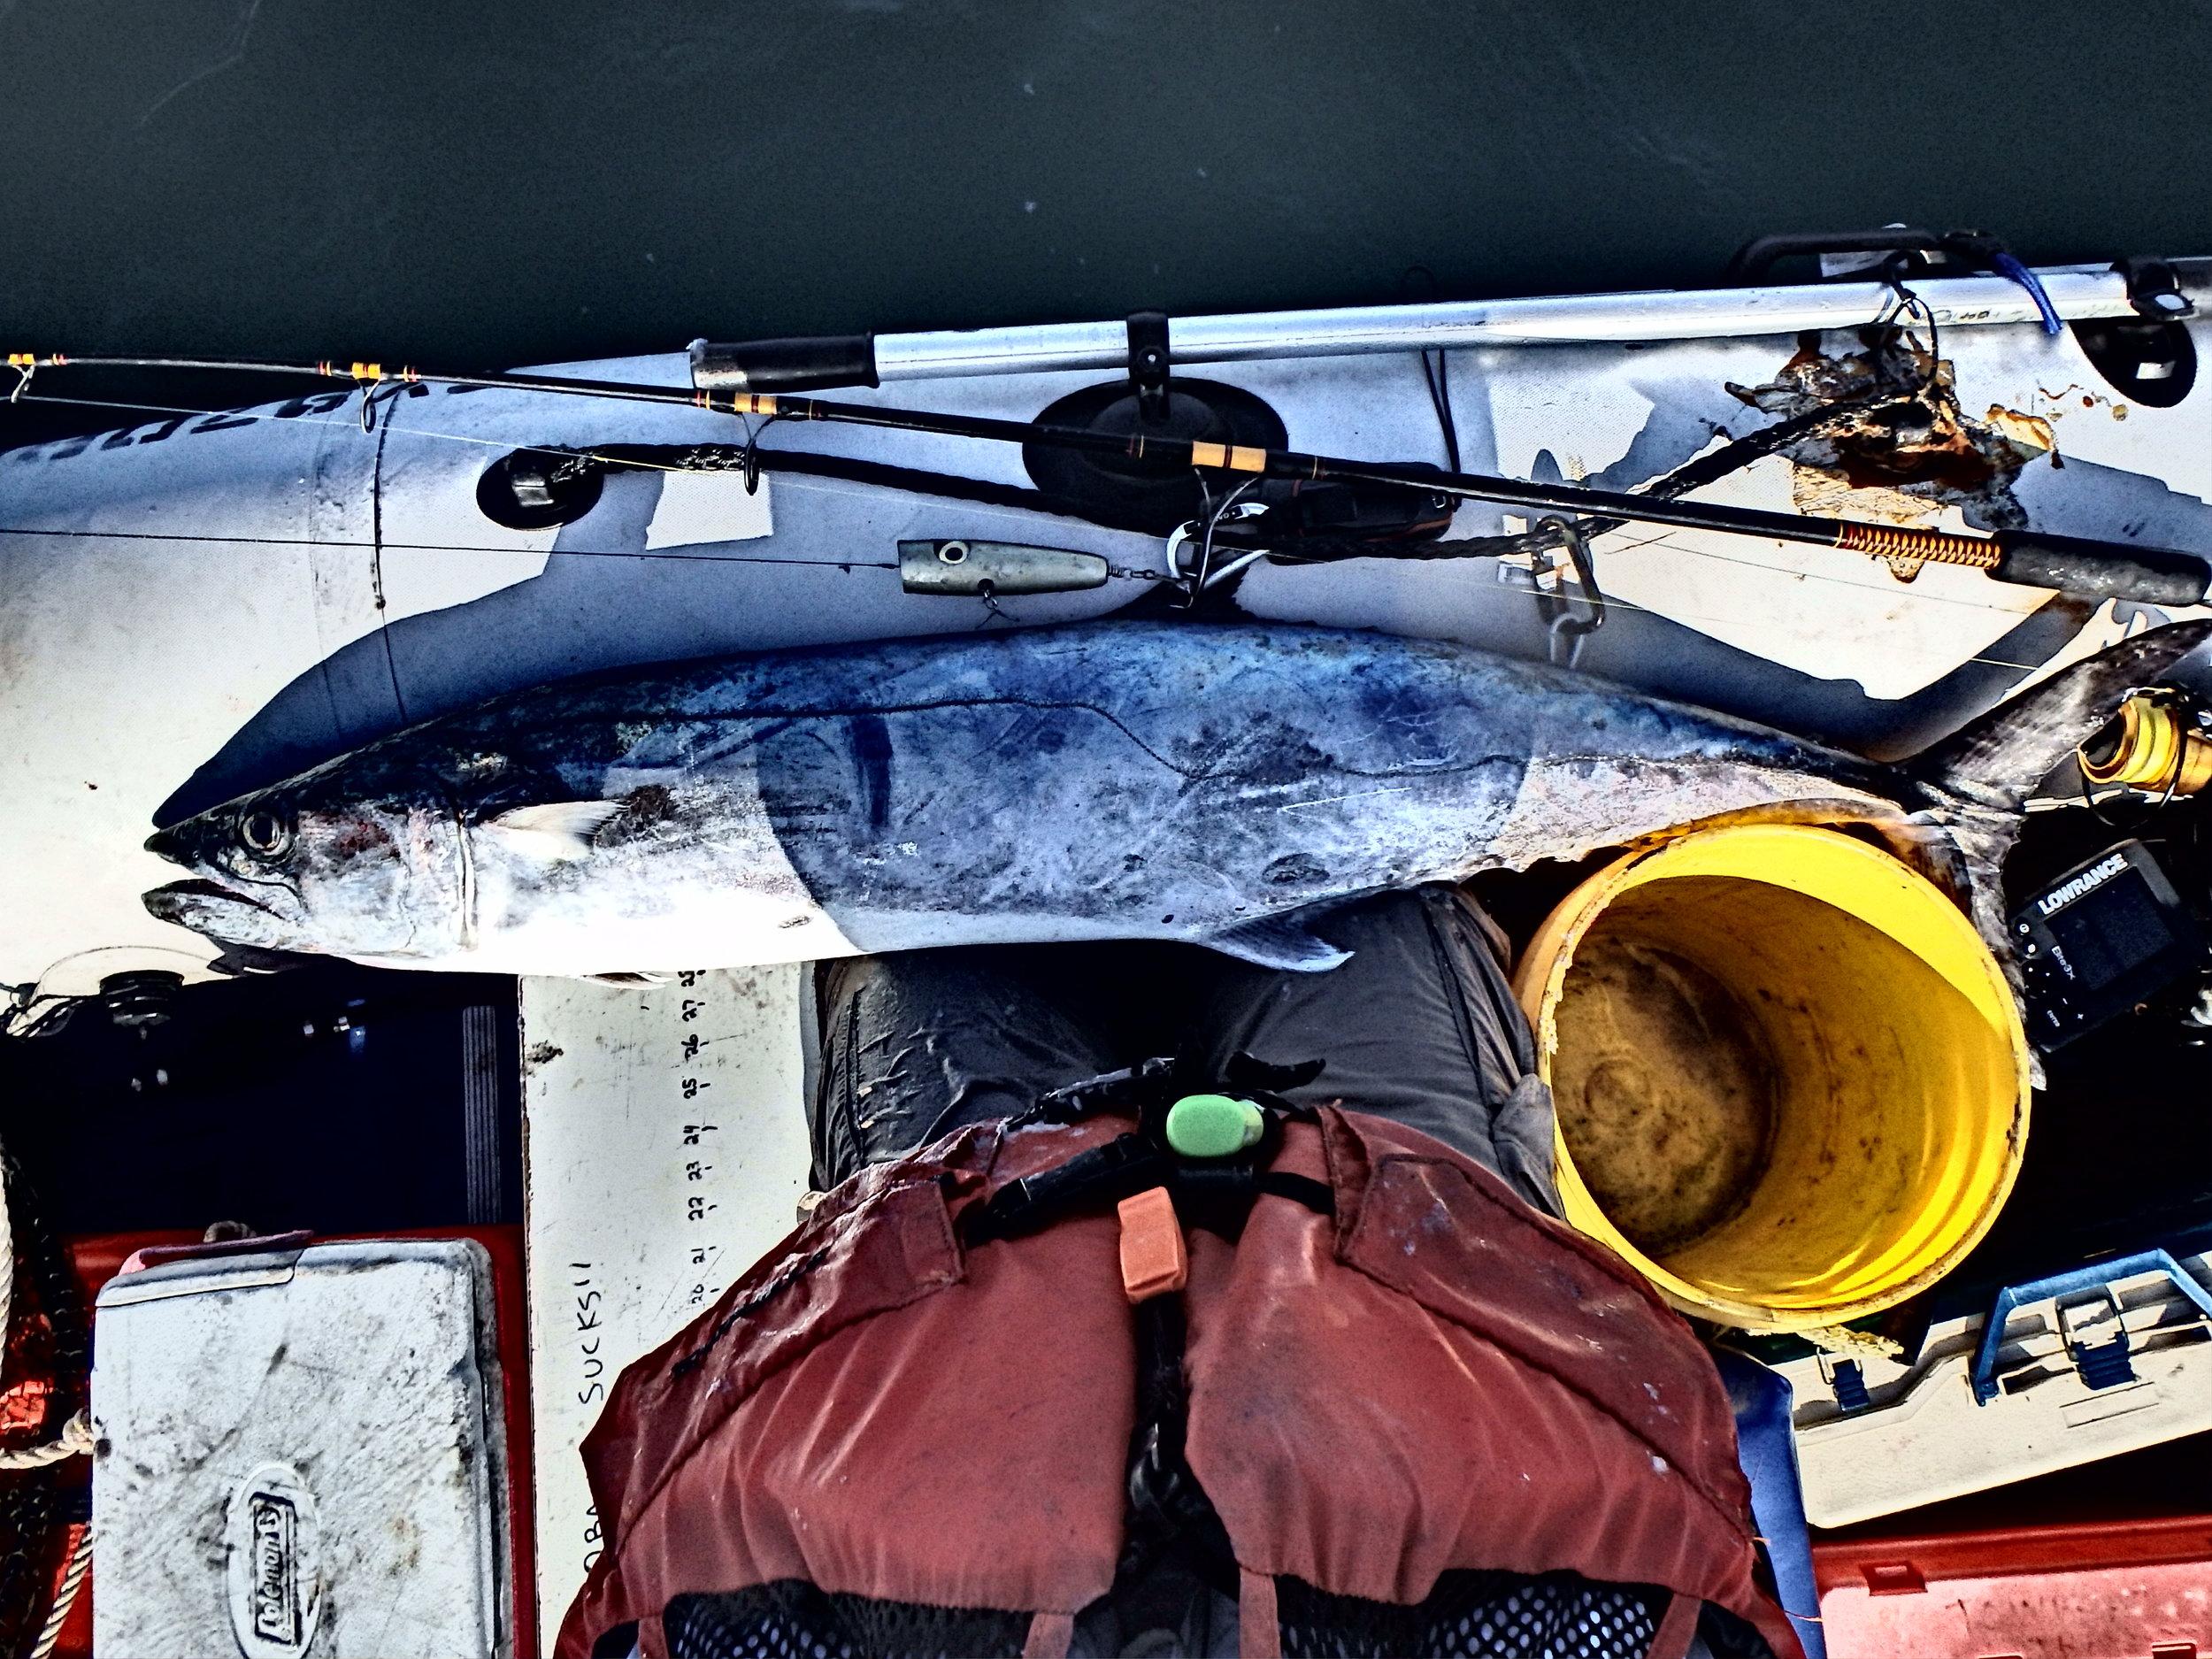 King Mackerel on lure 2 miles offshore